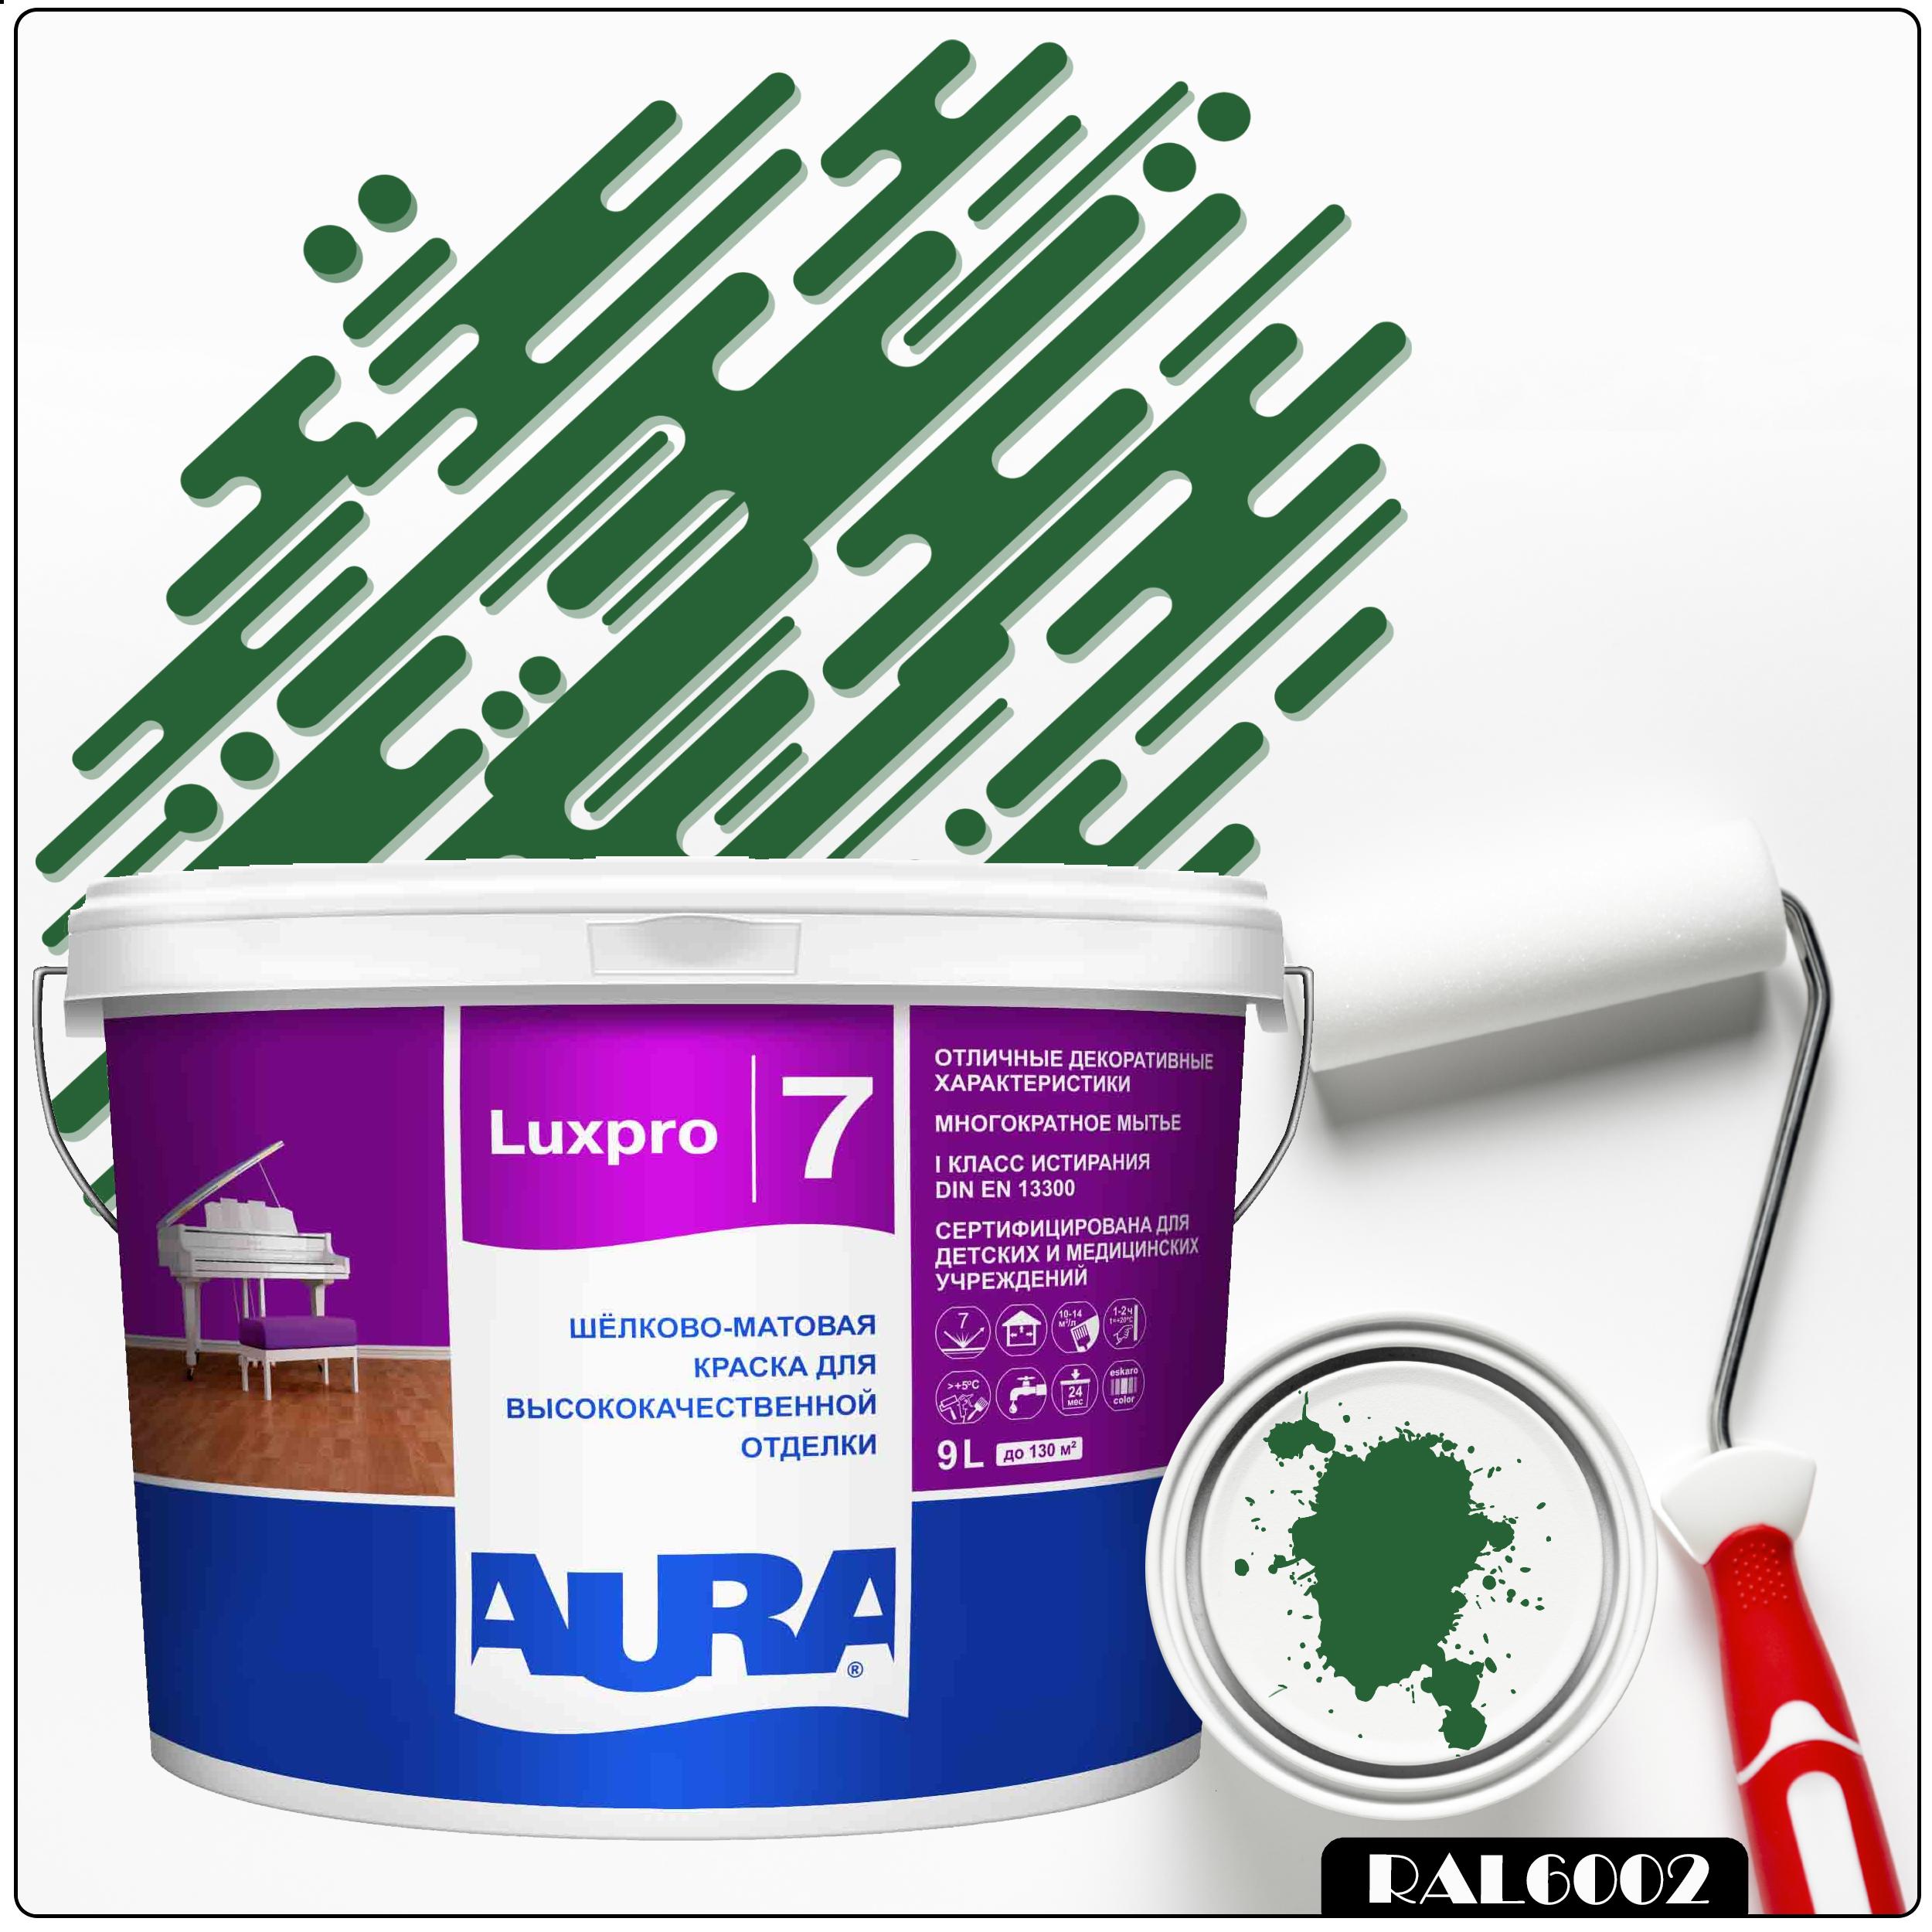 Фото 3 - Краска Aura LuxPRO 7, RAL 6002 Зеленый лист, латексная, шелково-матовая, интерьерная, 9л, Аура.